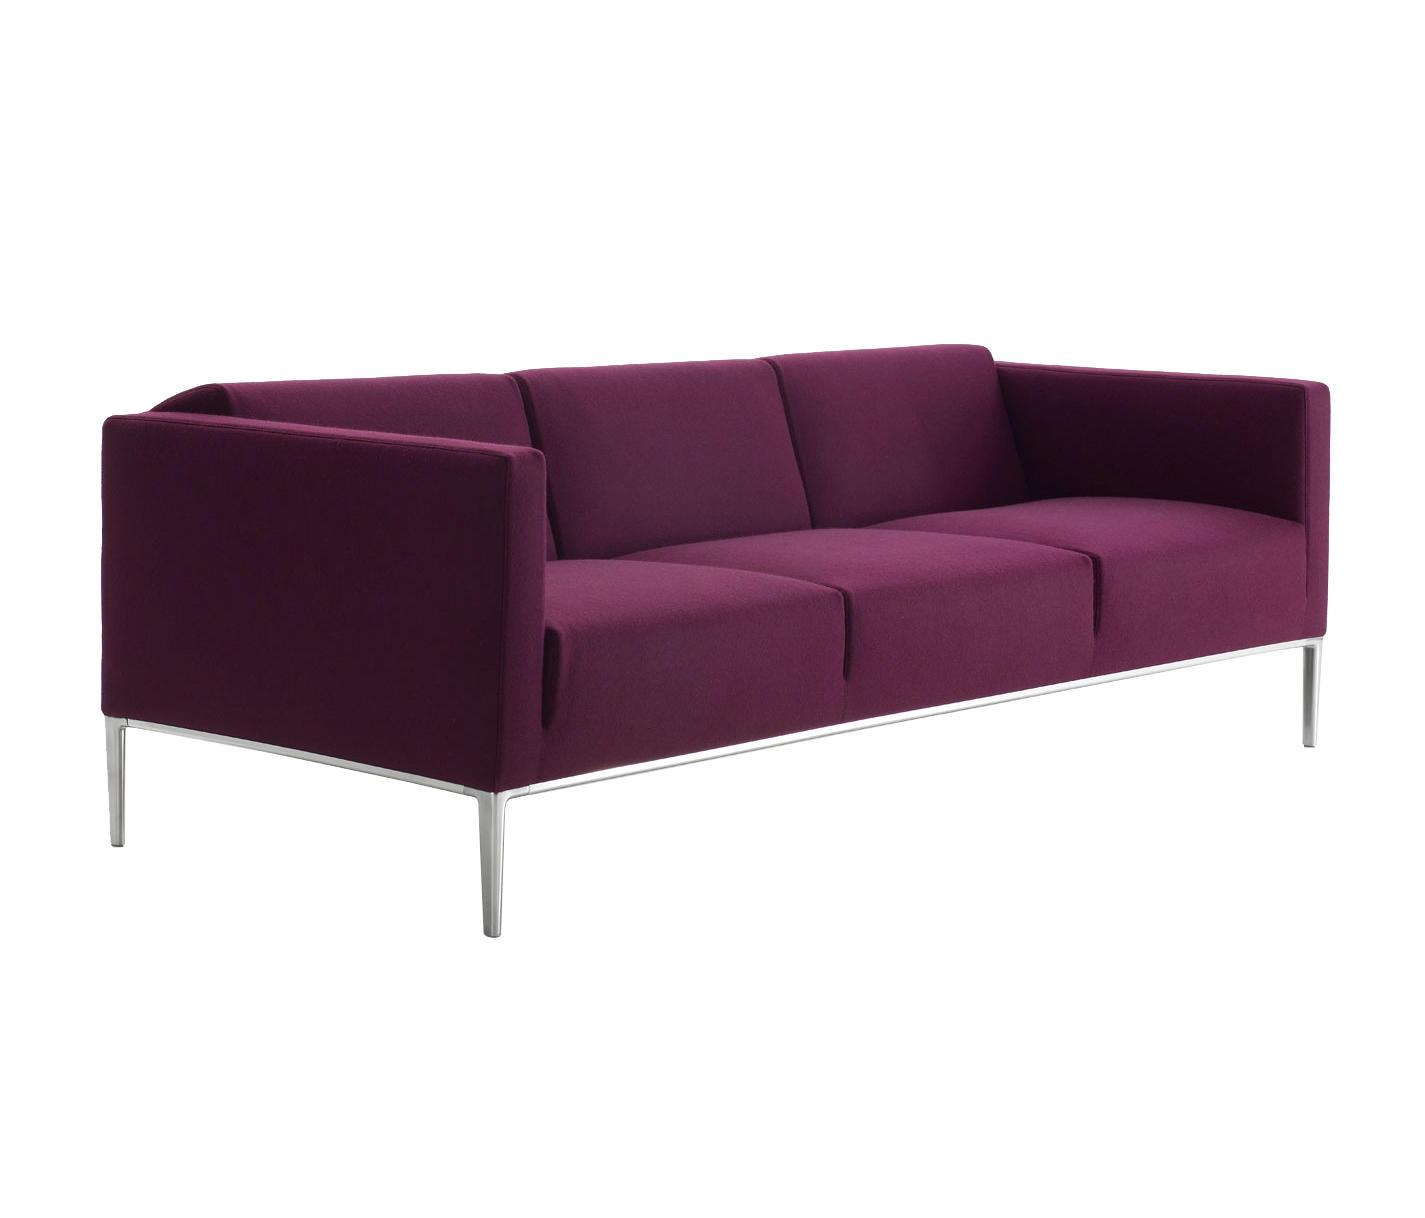 jean sofa canap s d 39 attente de b b italia architonic. Black Bedroom Furniture Sets. Home Design Ideas